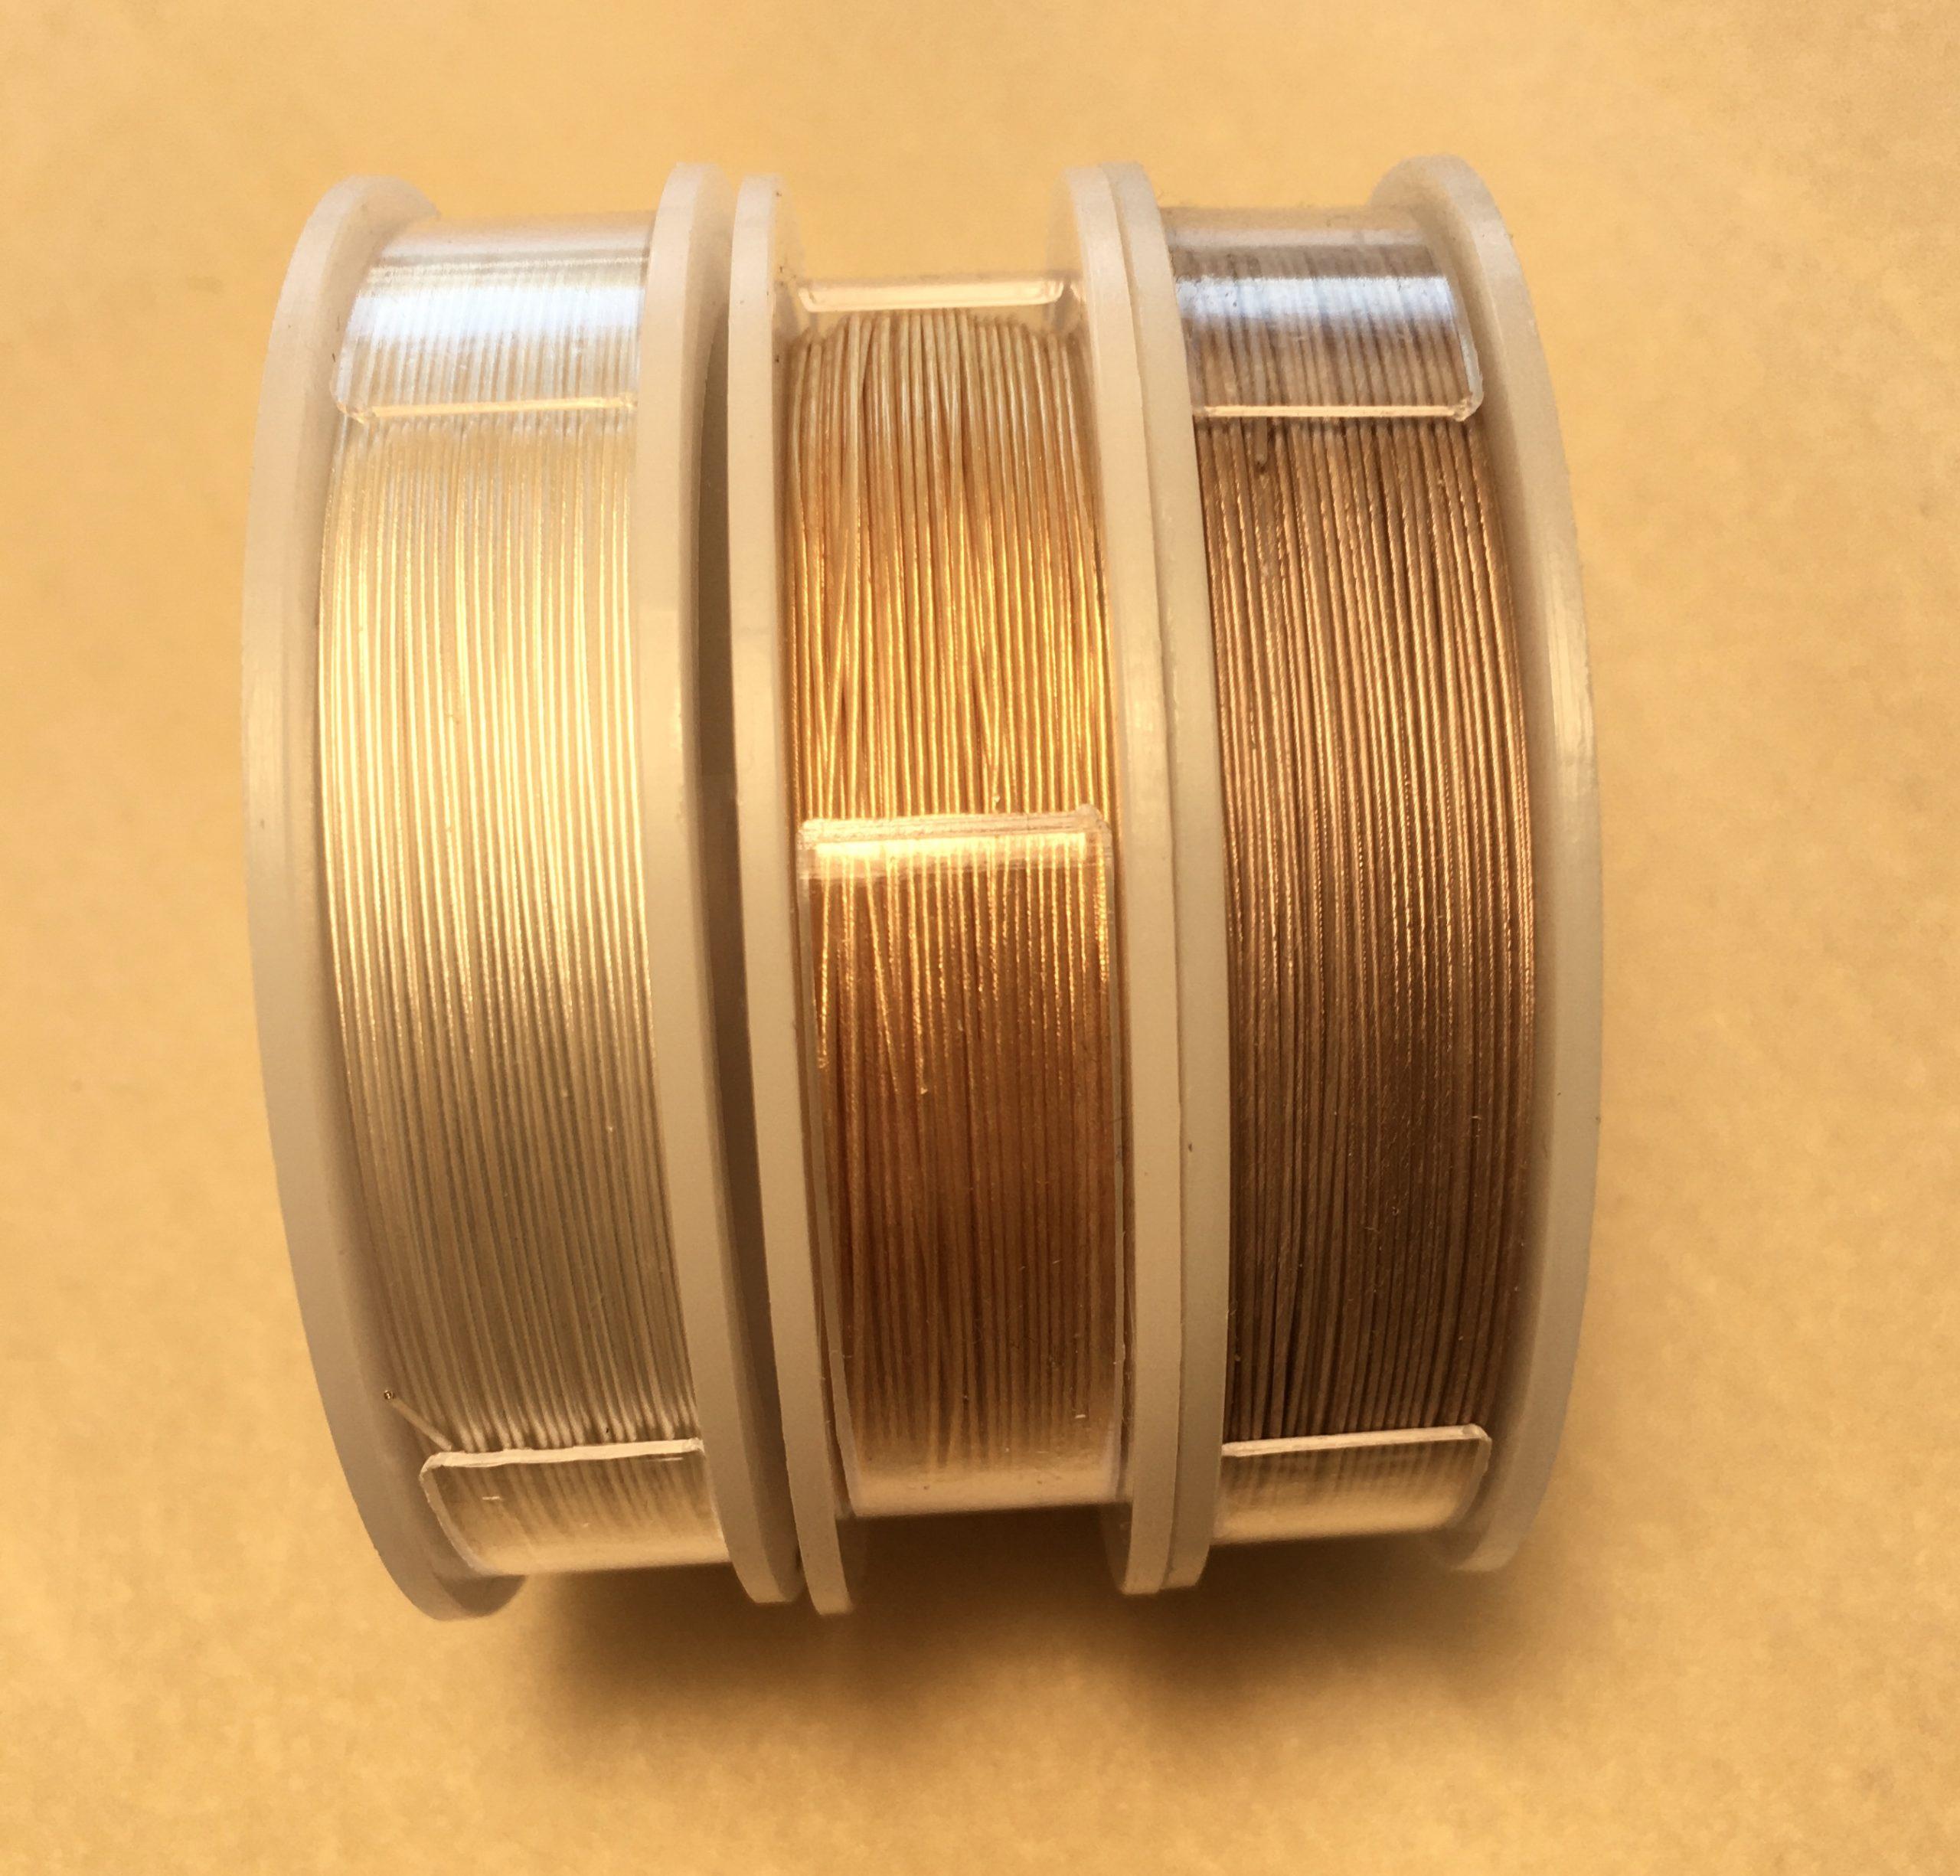 Variety of Sizes -22kt Gold Pl.- 1 Spool Ea. Extreme Soft Flex